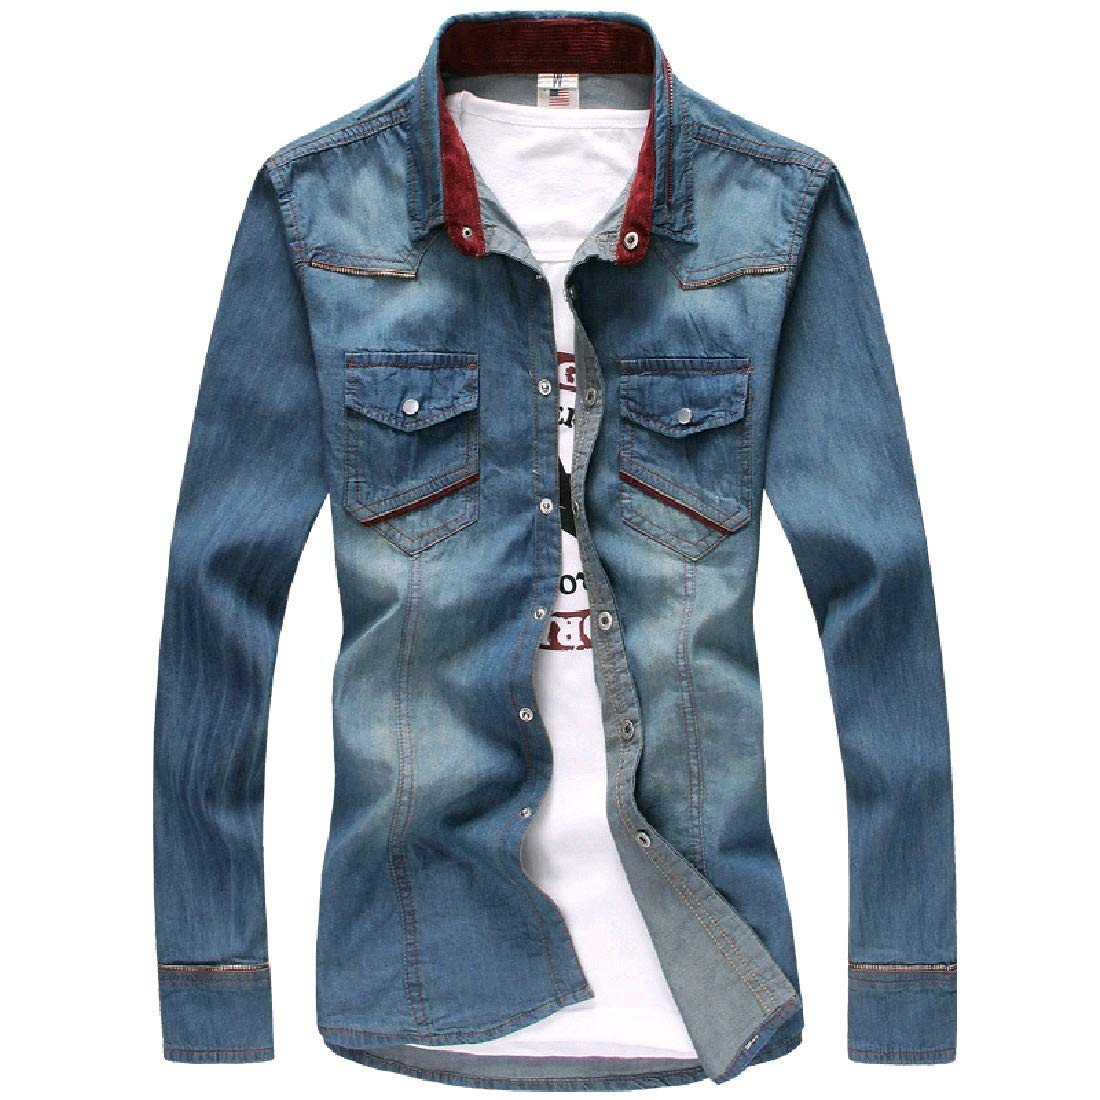 SportsX Men Classic Inner Contrast Denim Button Down Tshirt Top Shirt